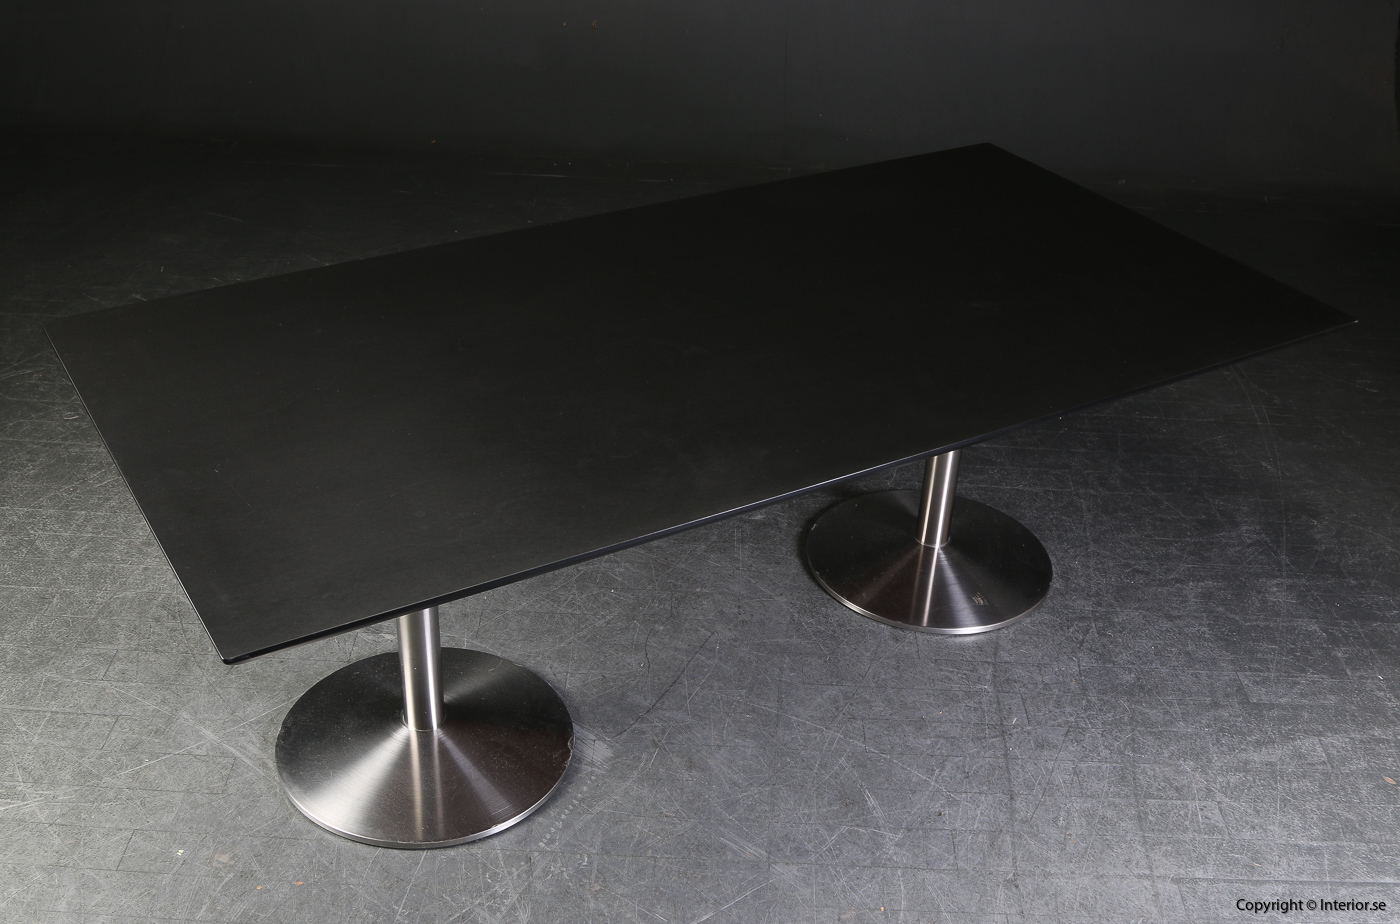 Konferensbord conference table, Svart linoleum - 220 x 110 cm 2